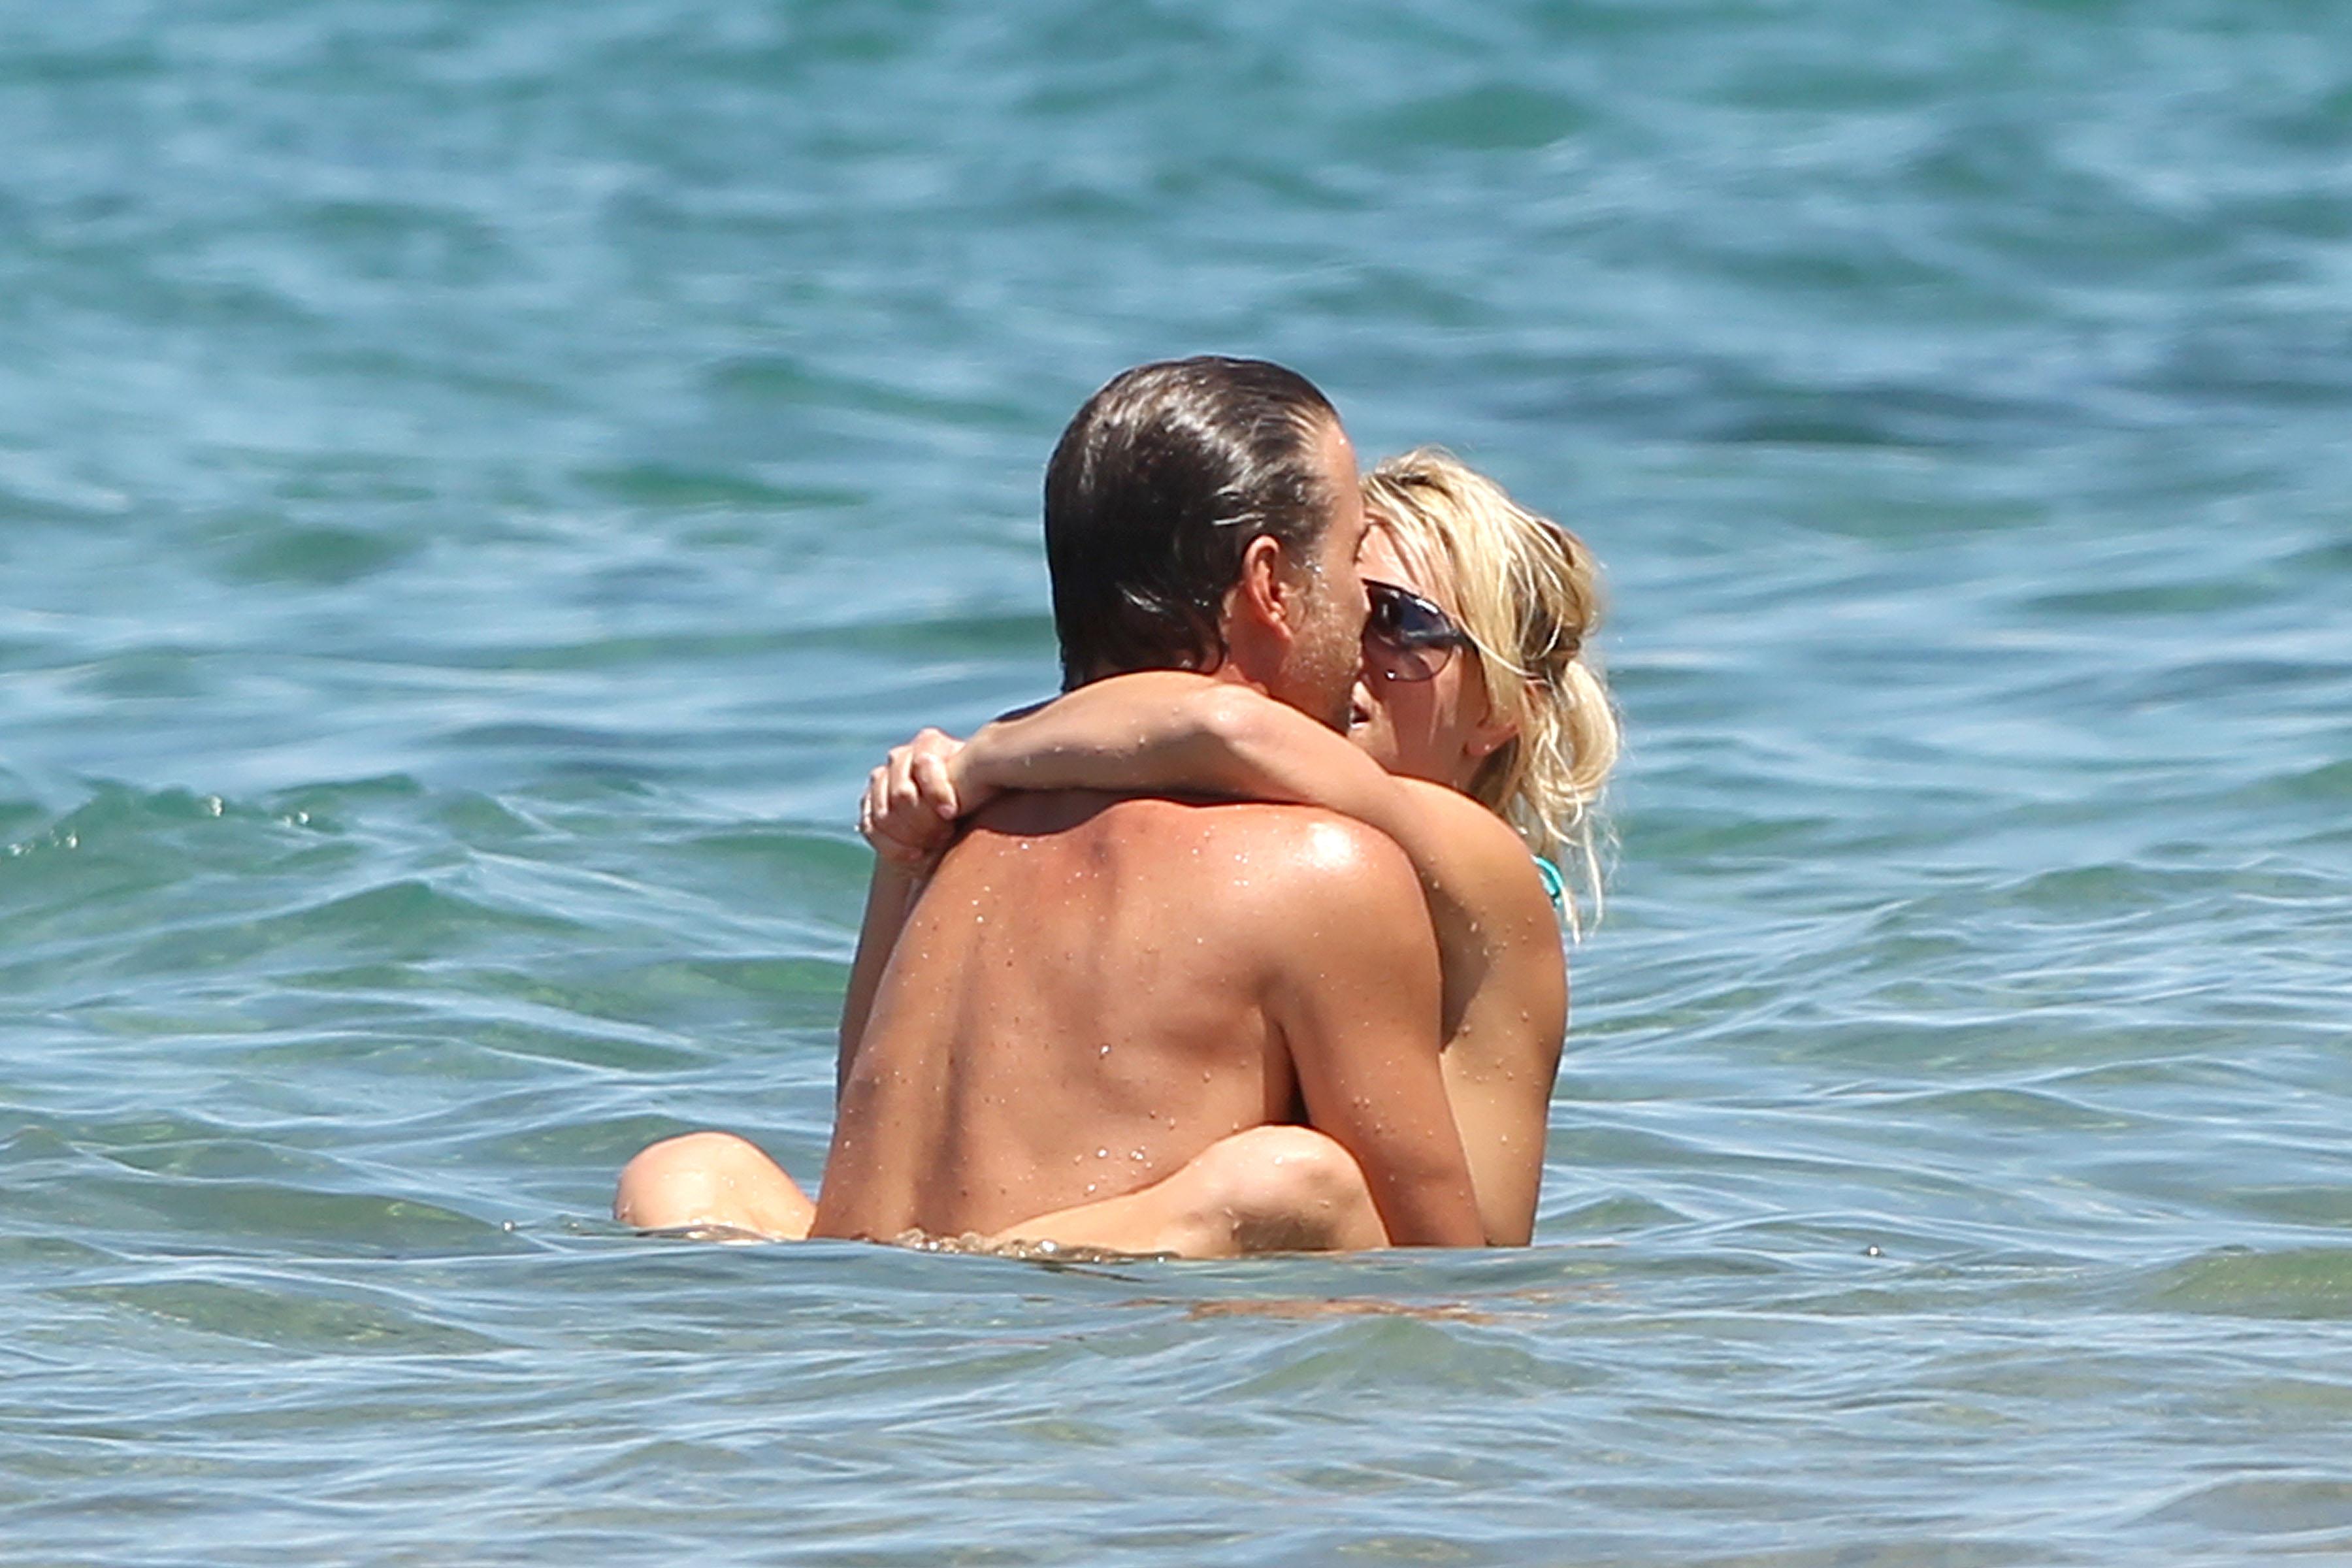 21399_Britney_Spears_on_the_beach_in_Maui_3_122_91lo.jpg